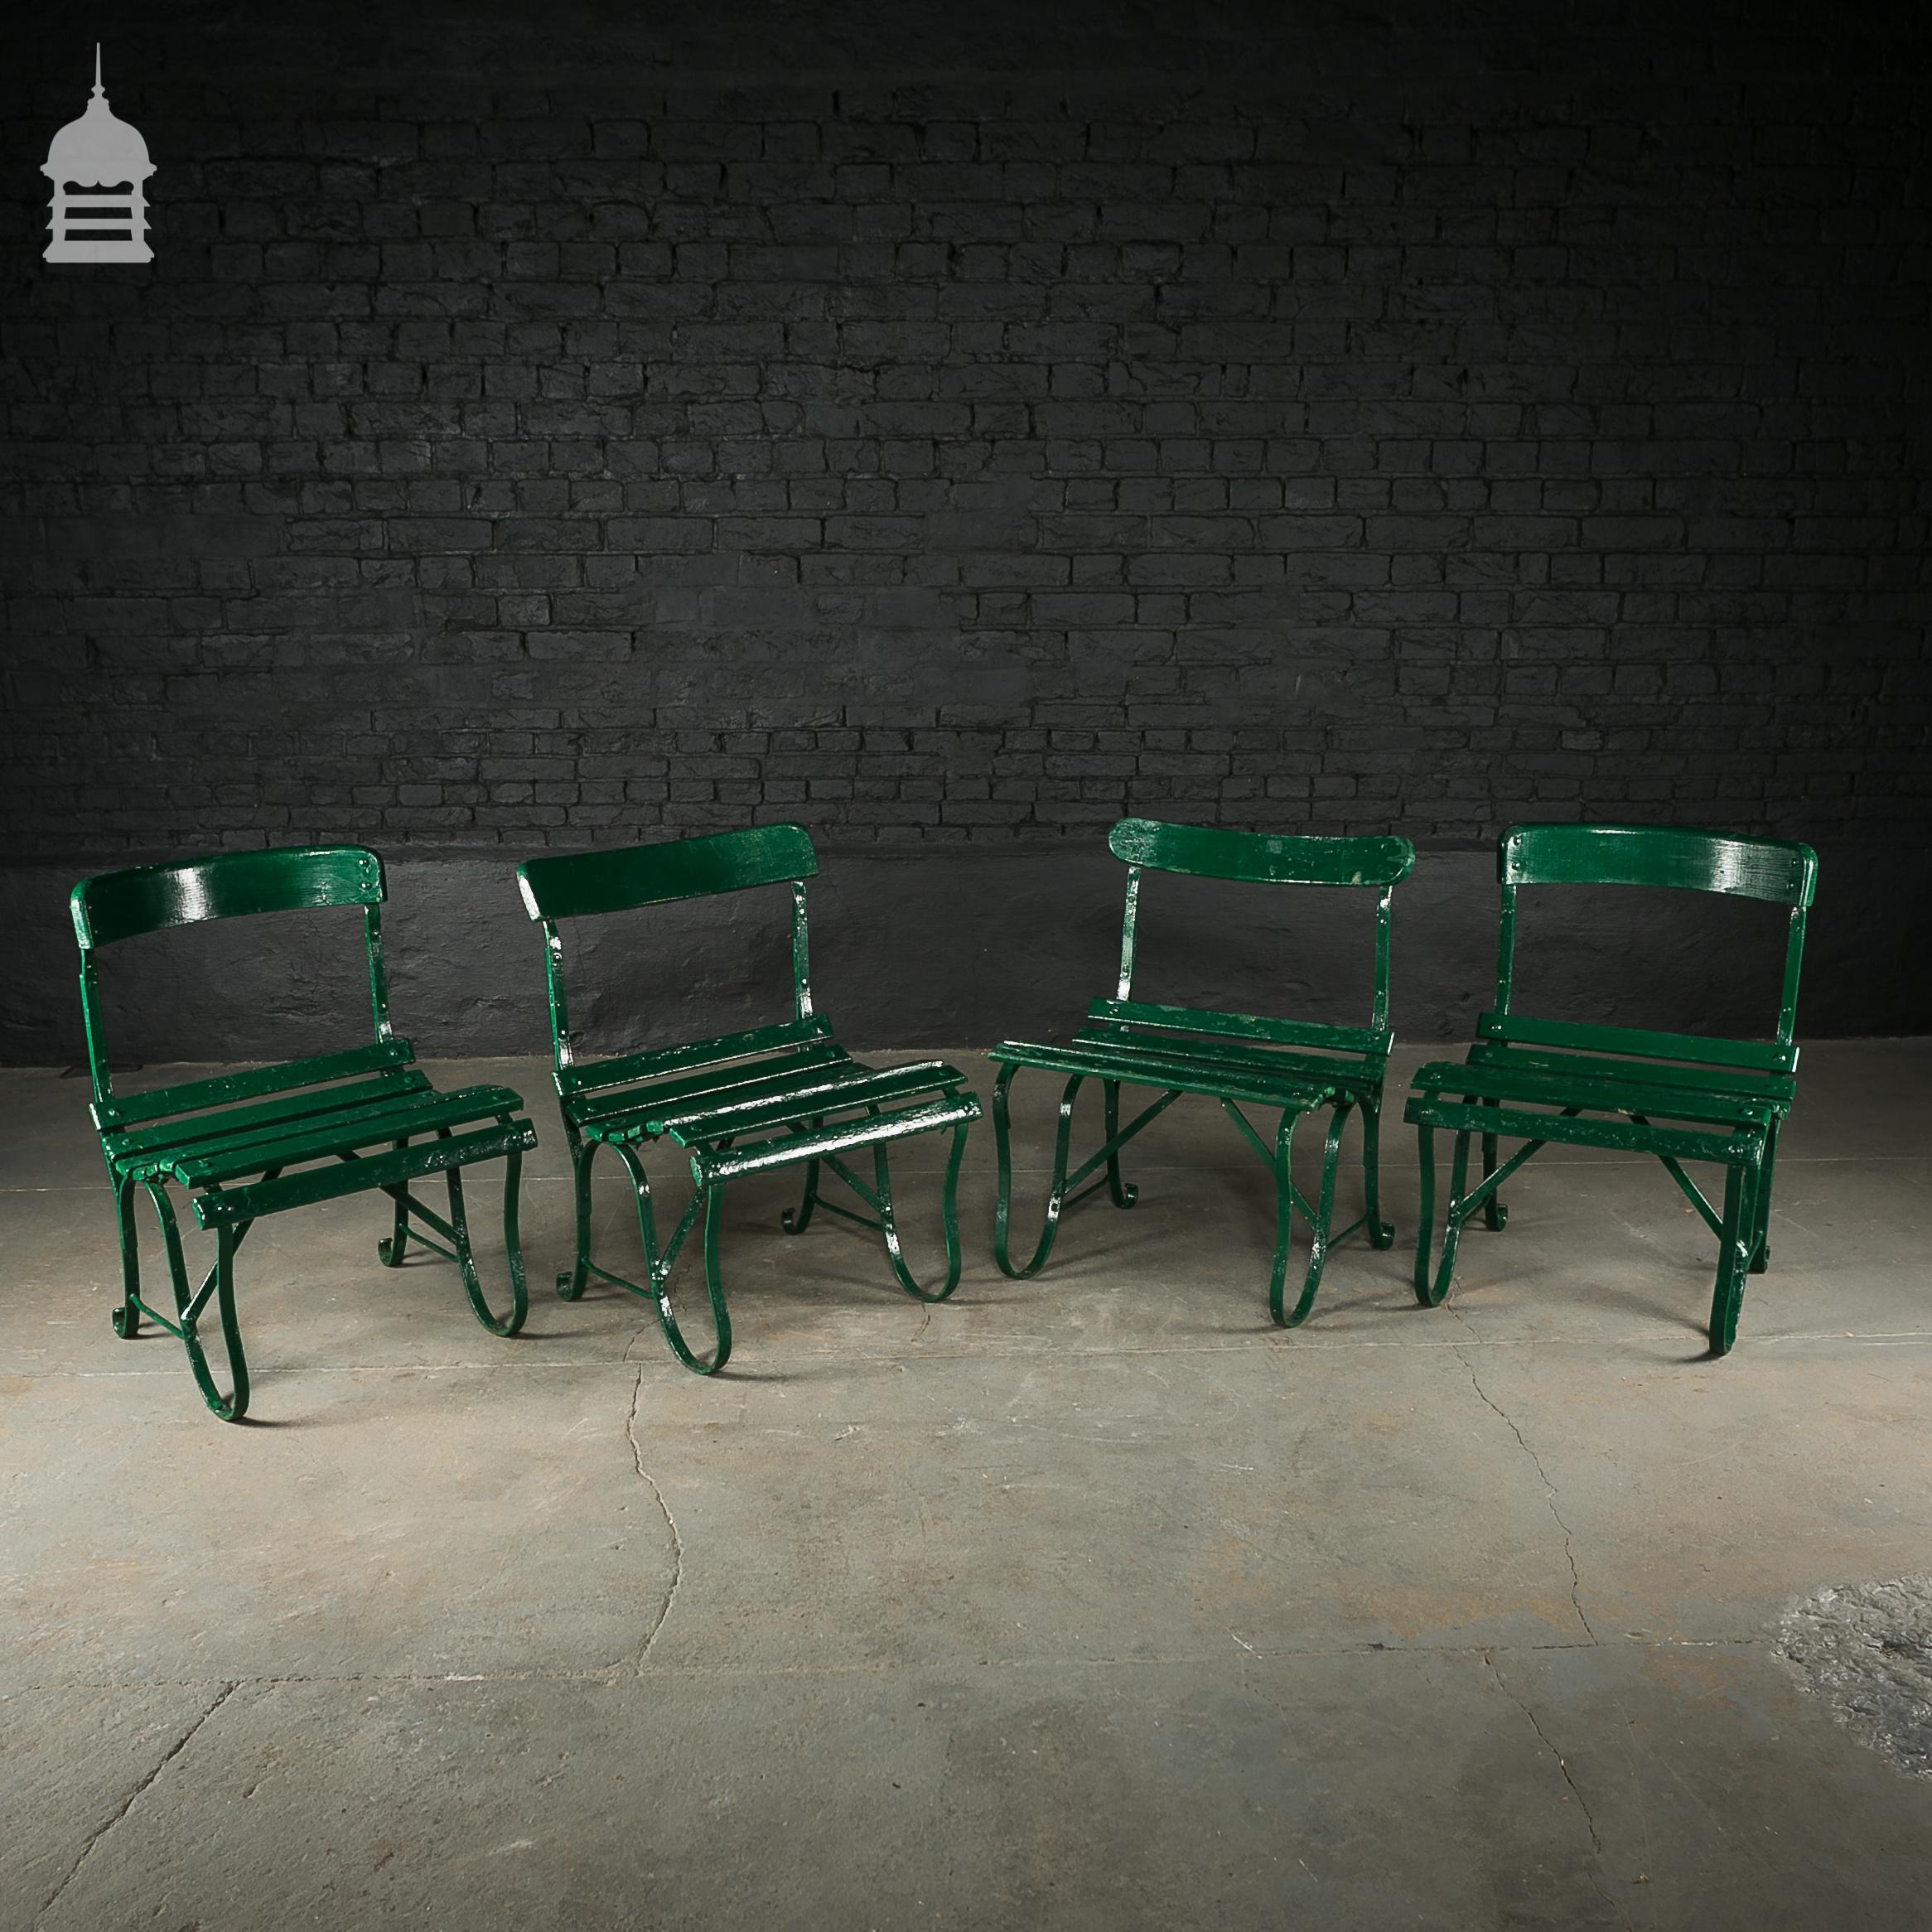 4 Wrought Iron Garden Chairs with Hardwood Slats 2